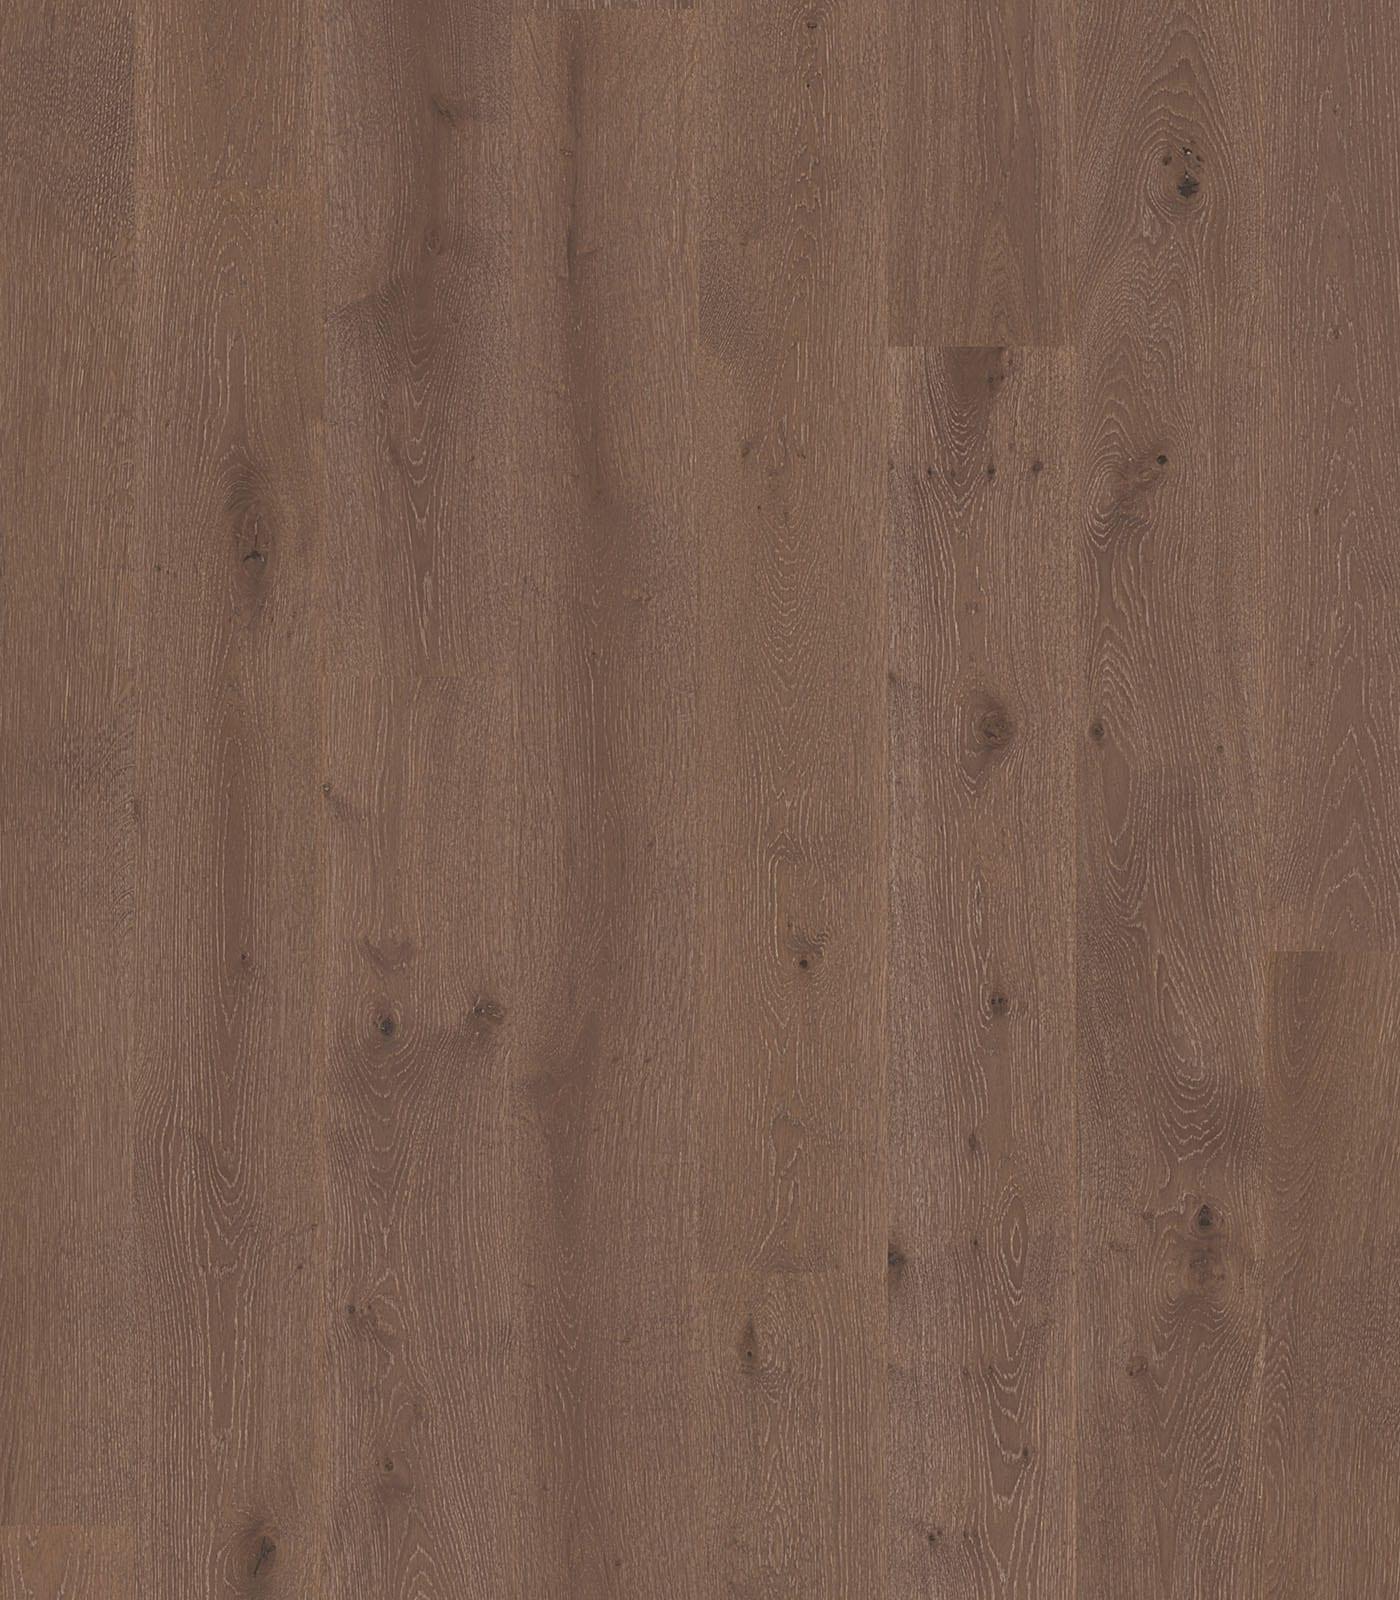 Metz Brown-European Oak Floors-Colors Collection-flat